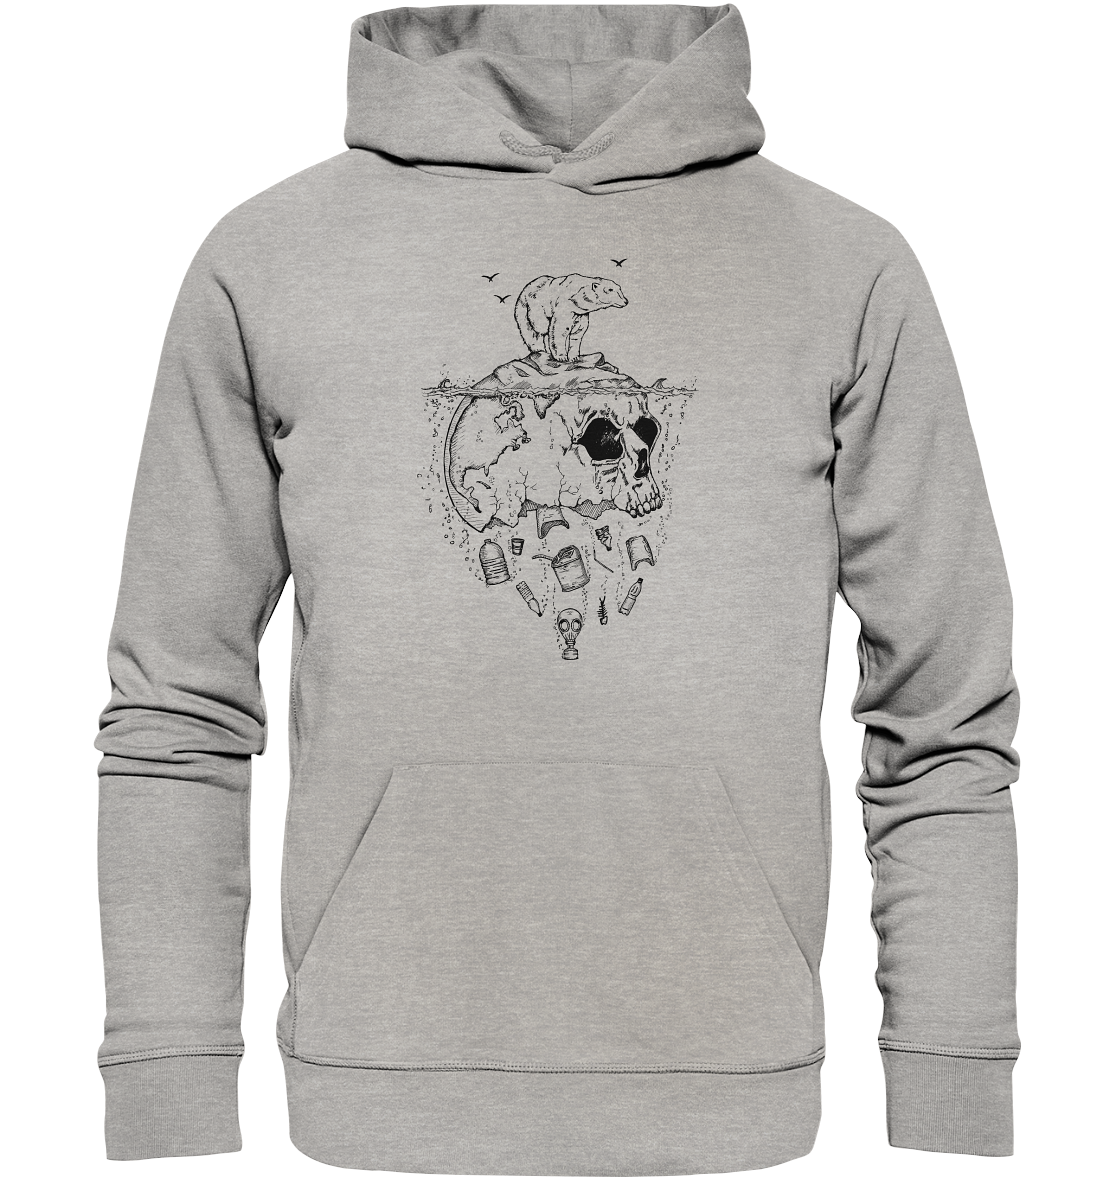 front-organic-hoodie-c2c1c0-1116x-3.png